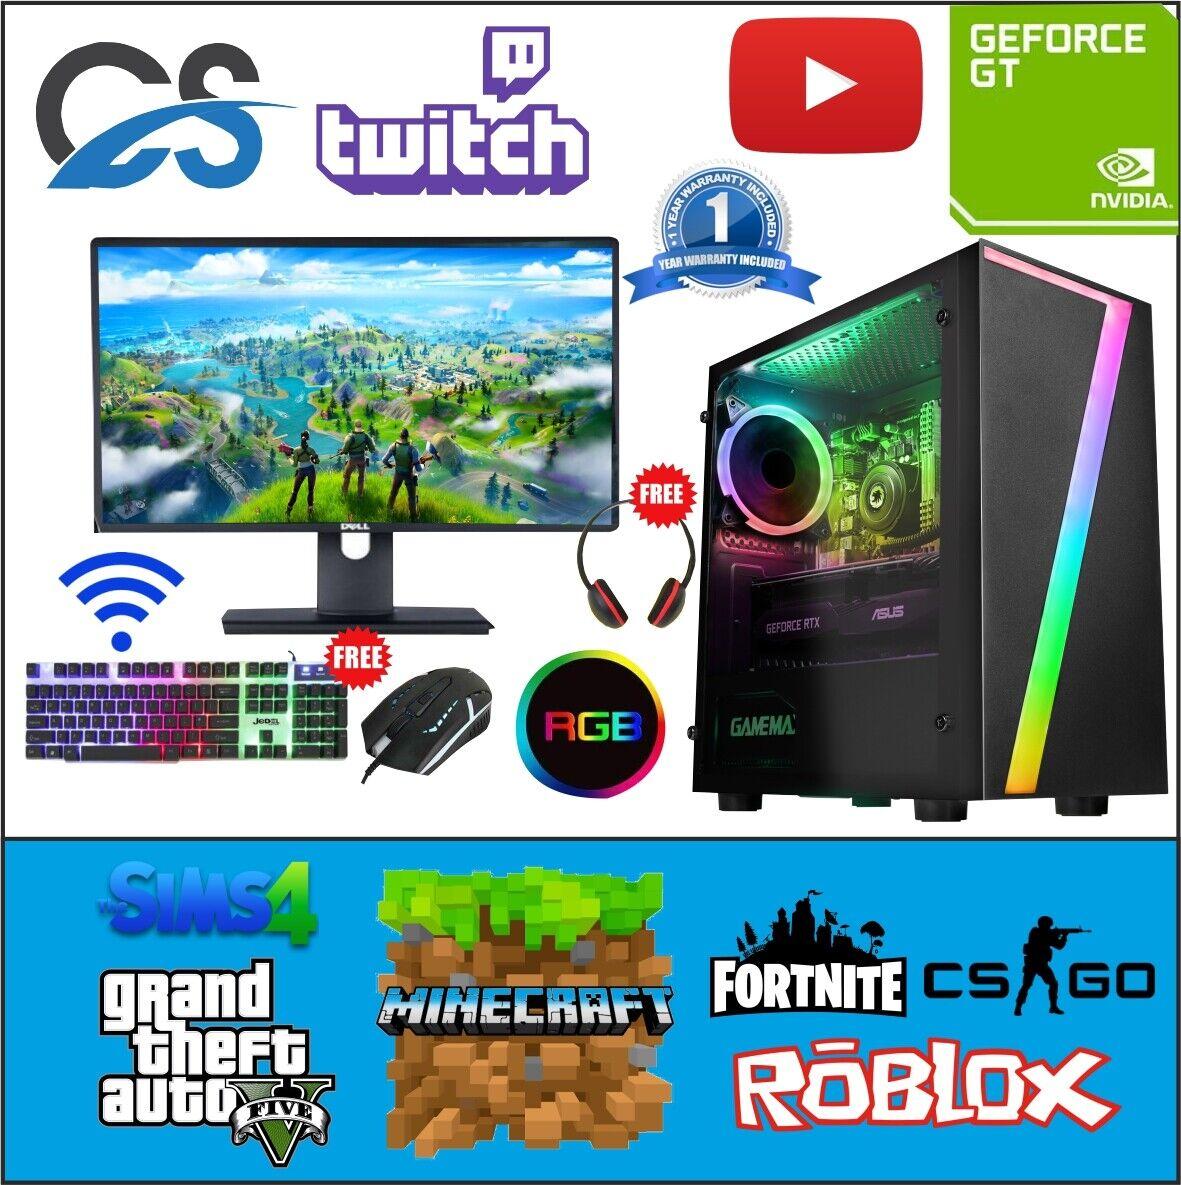 Computer Games - Fast Gaming PC Computer Bundle Intel Quad Core i5 16GB 1TB 2GB GT710 Windows 10